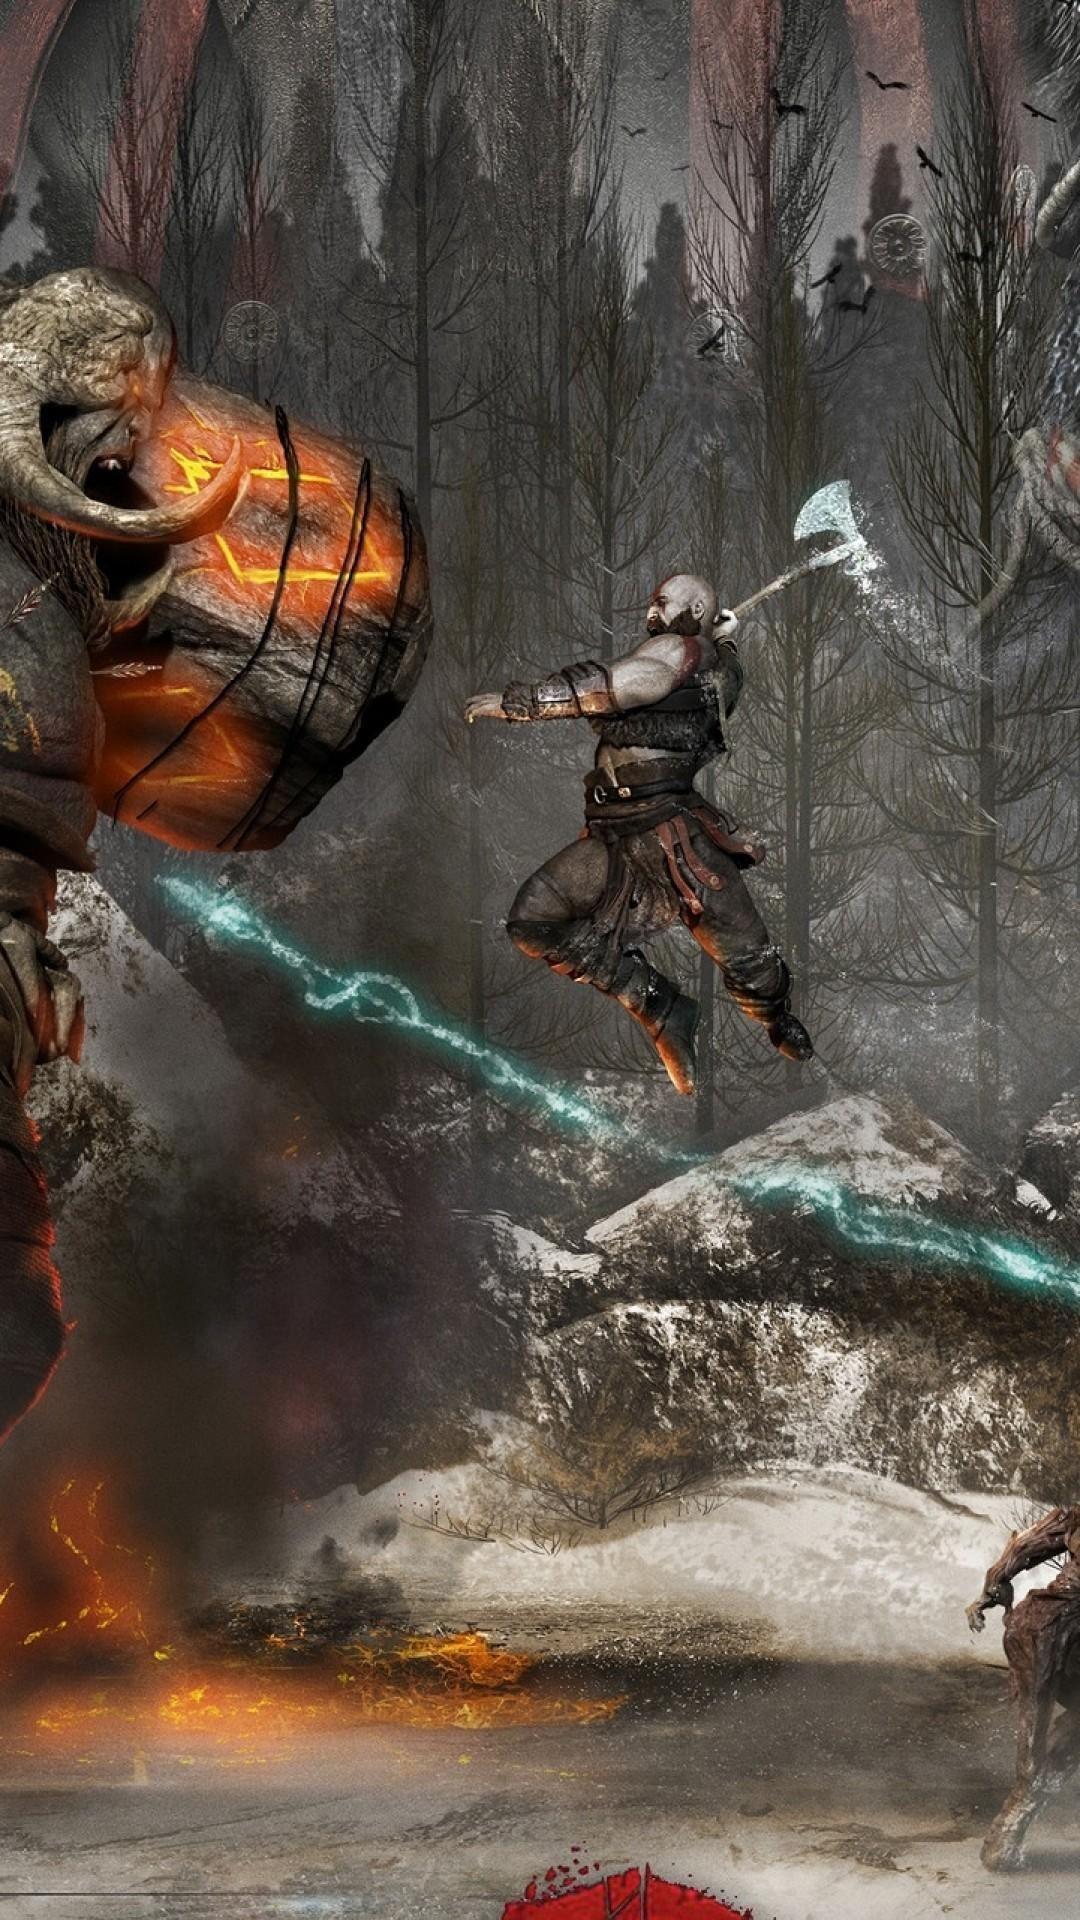 Beautiful God Of War Game 4k Wallpaper Images In 2020 Kratos God Of War God Of War God Of War Game